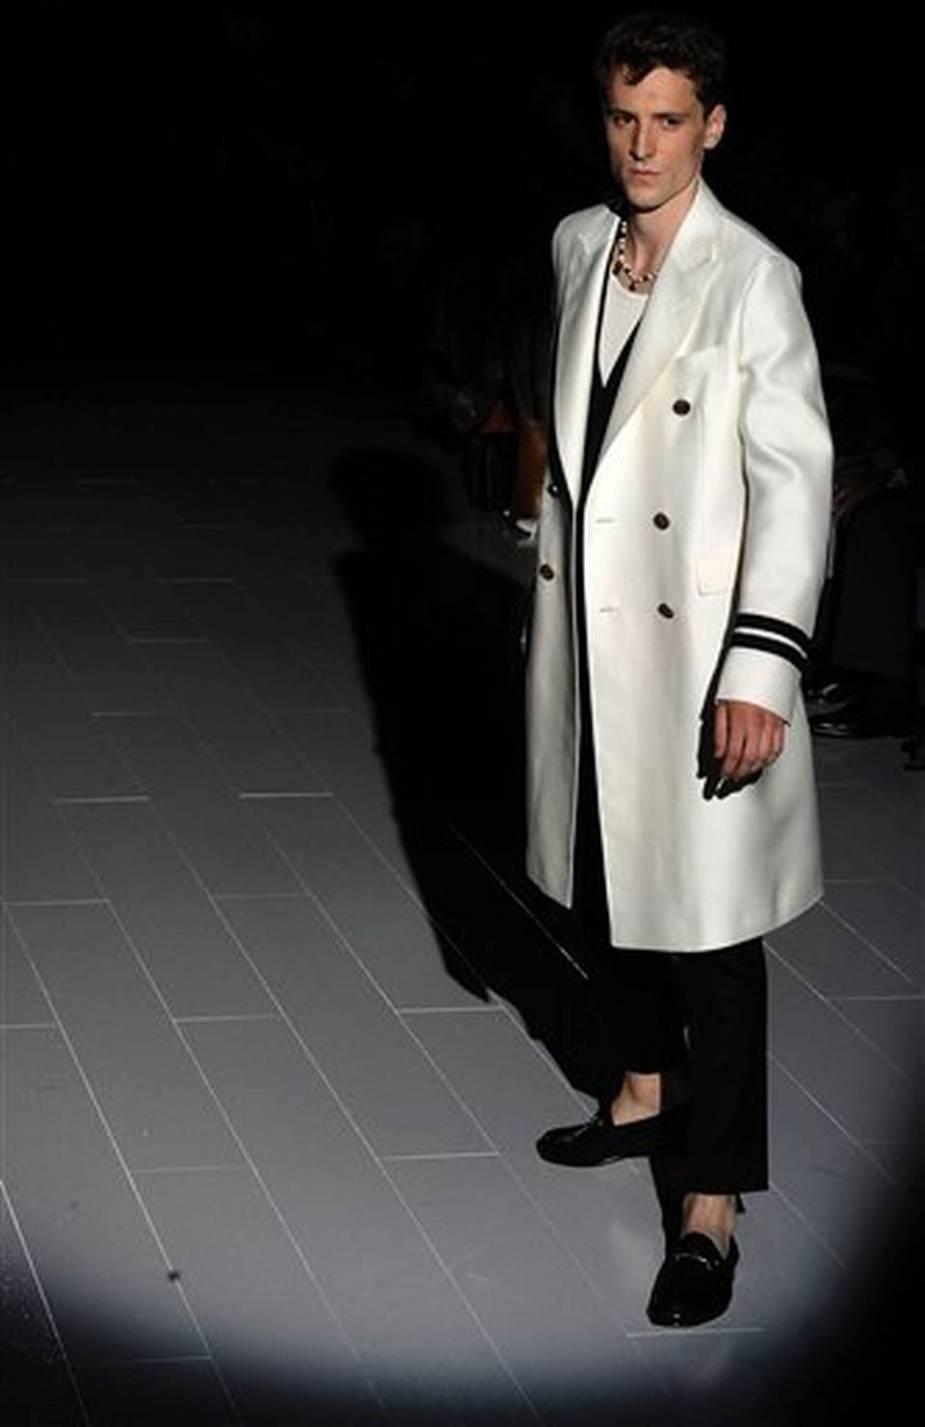 621Italy Fashion Gucci